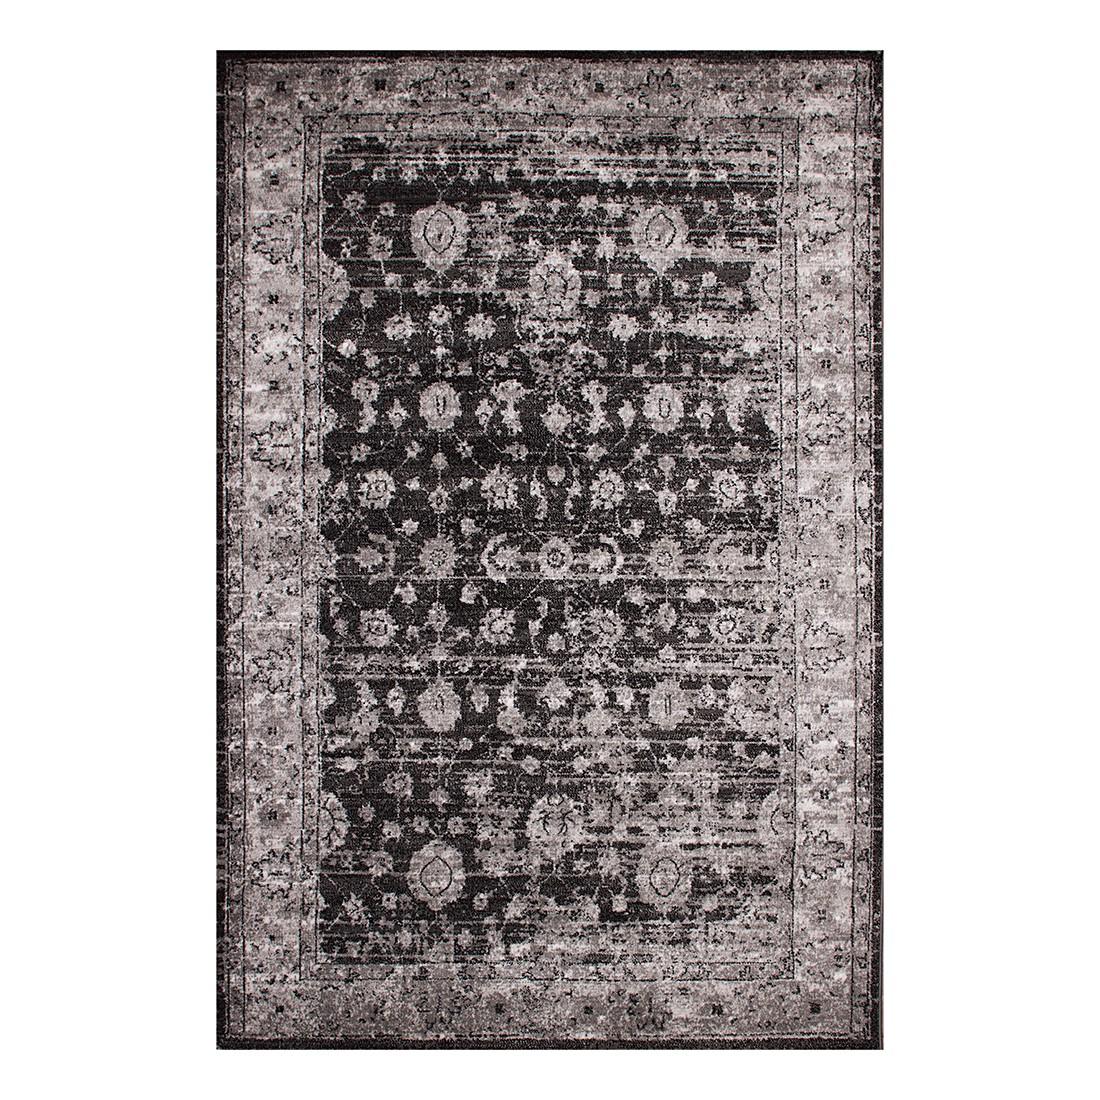 Teppich Bruges – Silber – 120 x 170 cm, Kayoom günstig